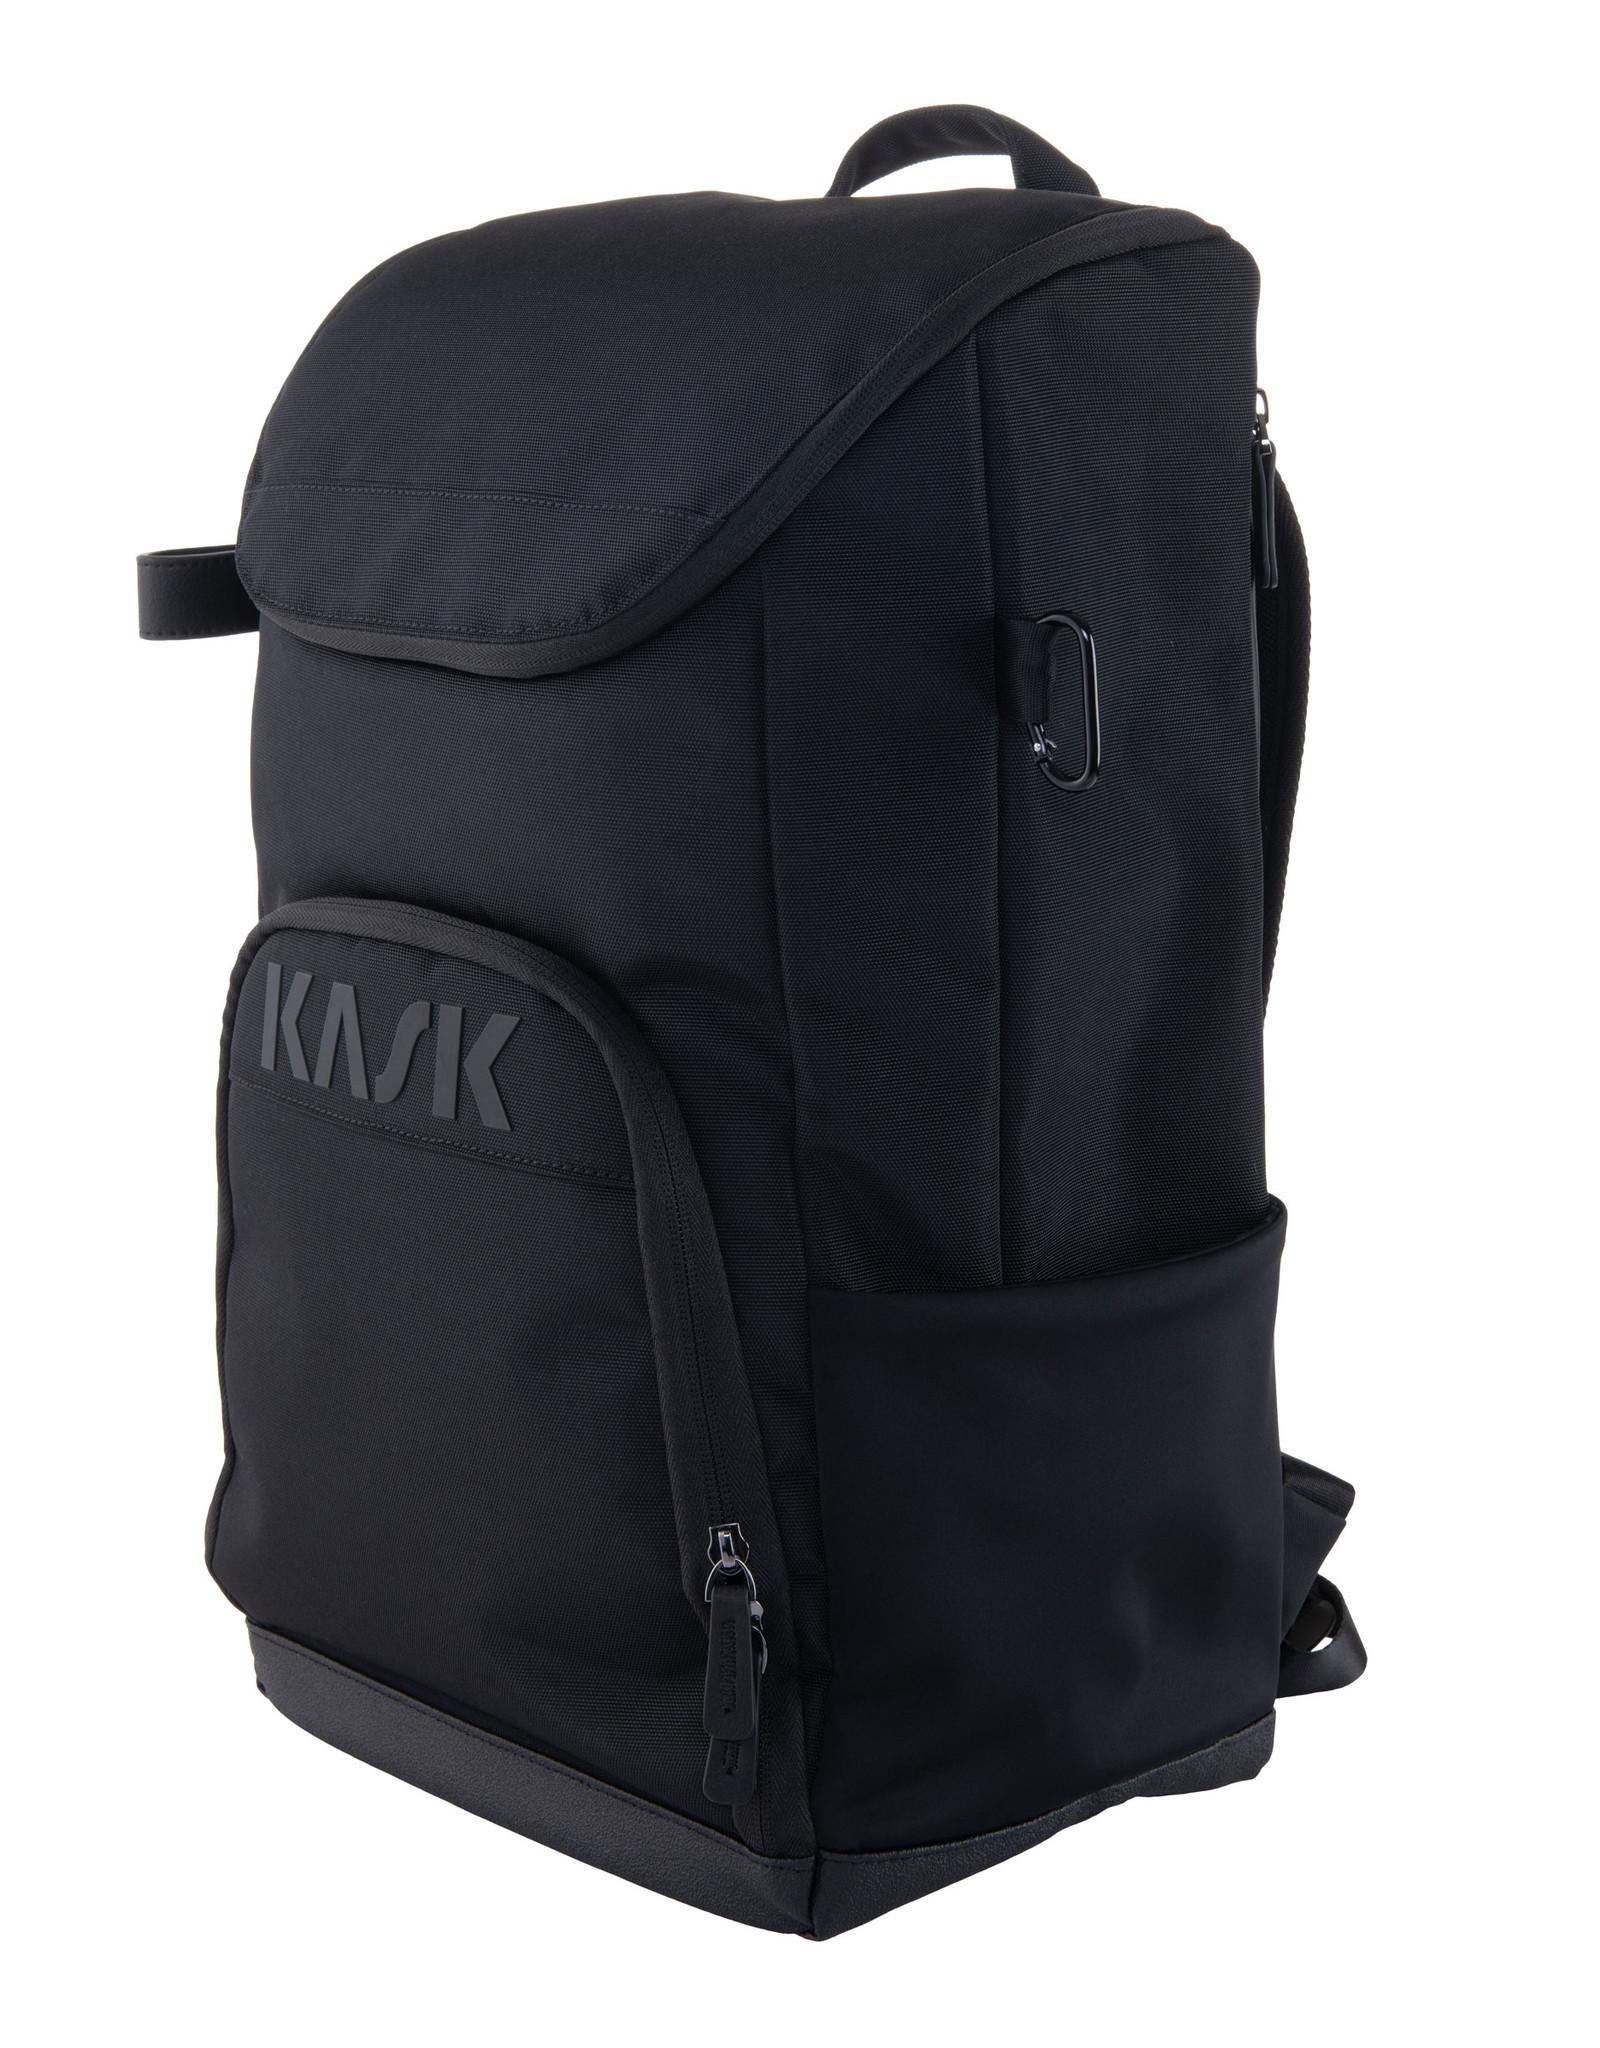 KASK KASK Vertigo Backpack